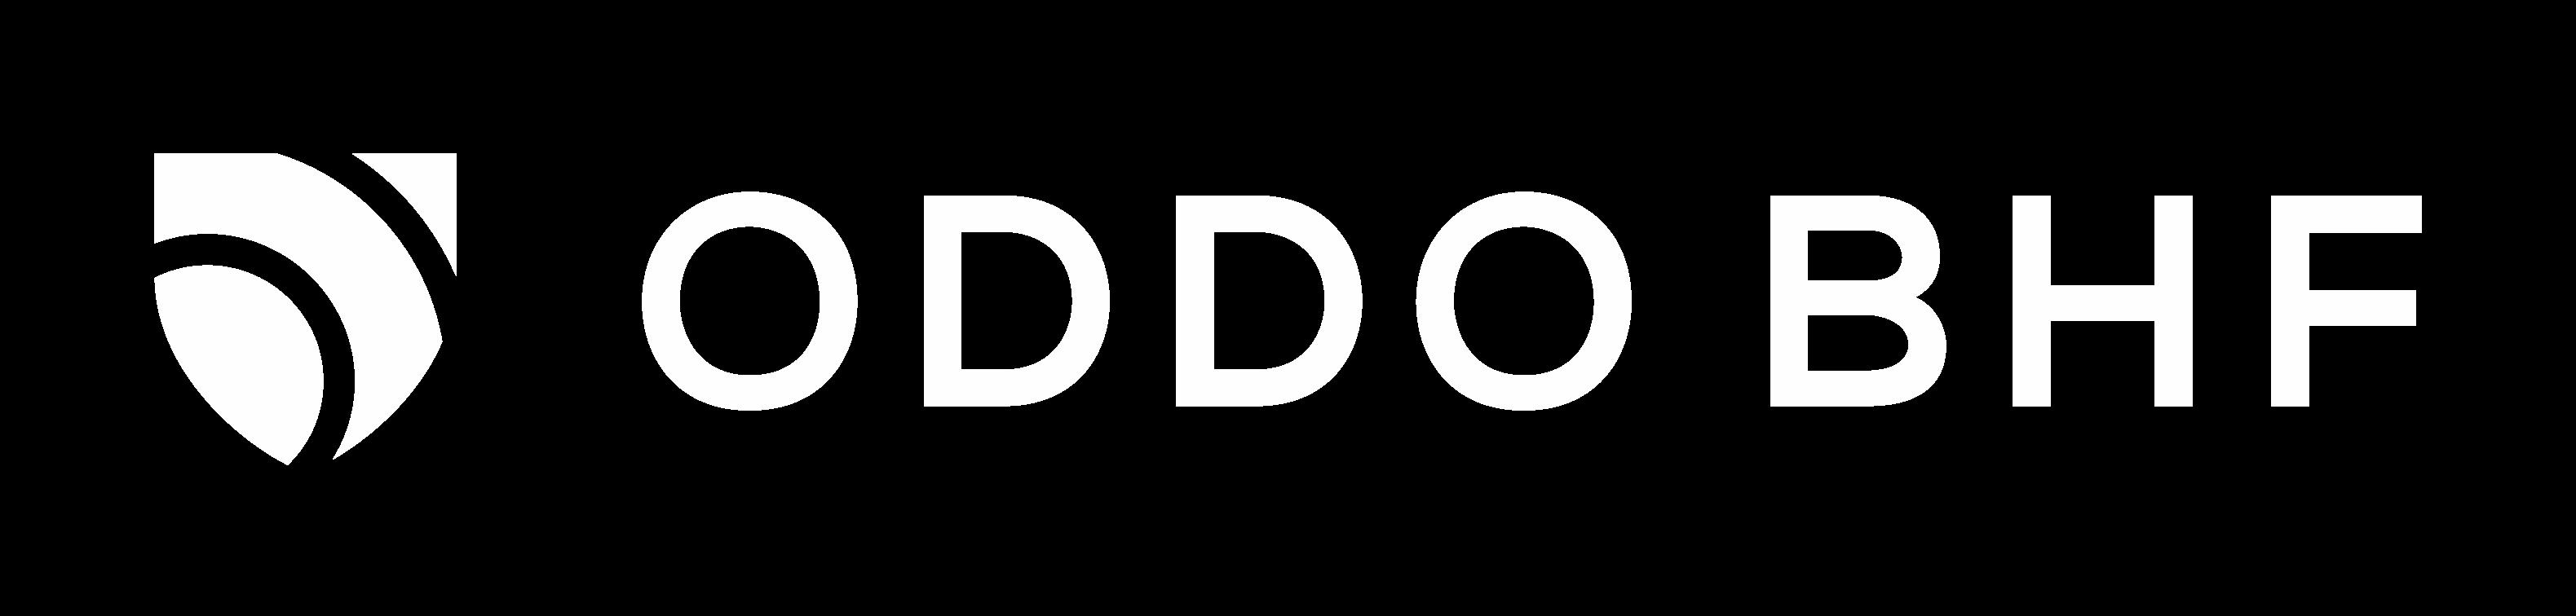 logo oddo bhf private equity